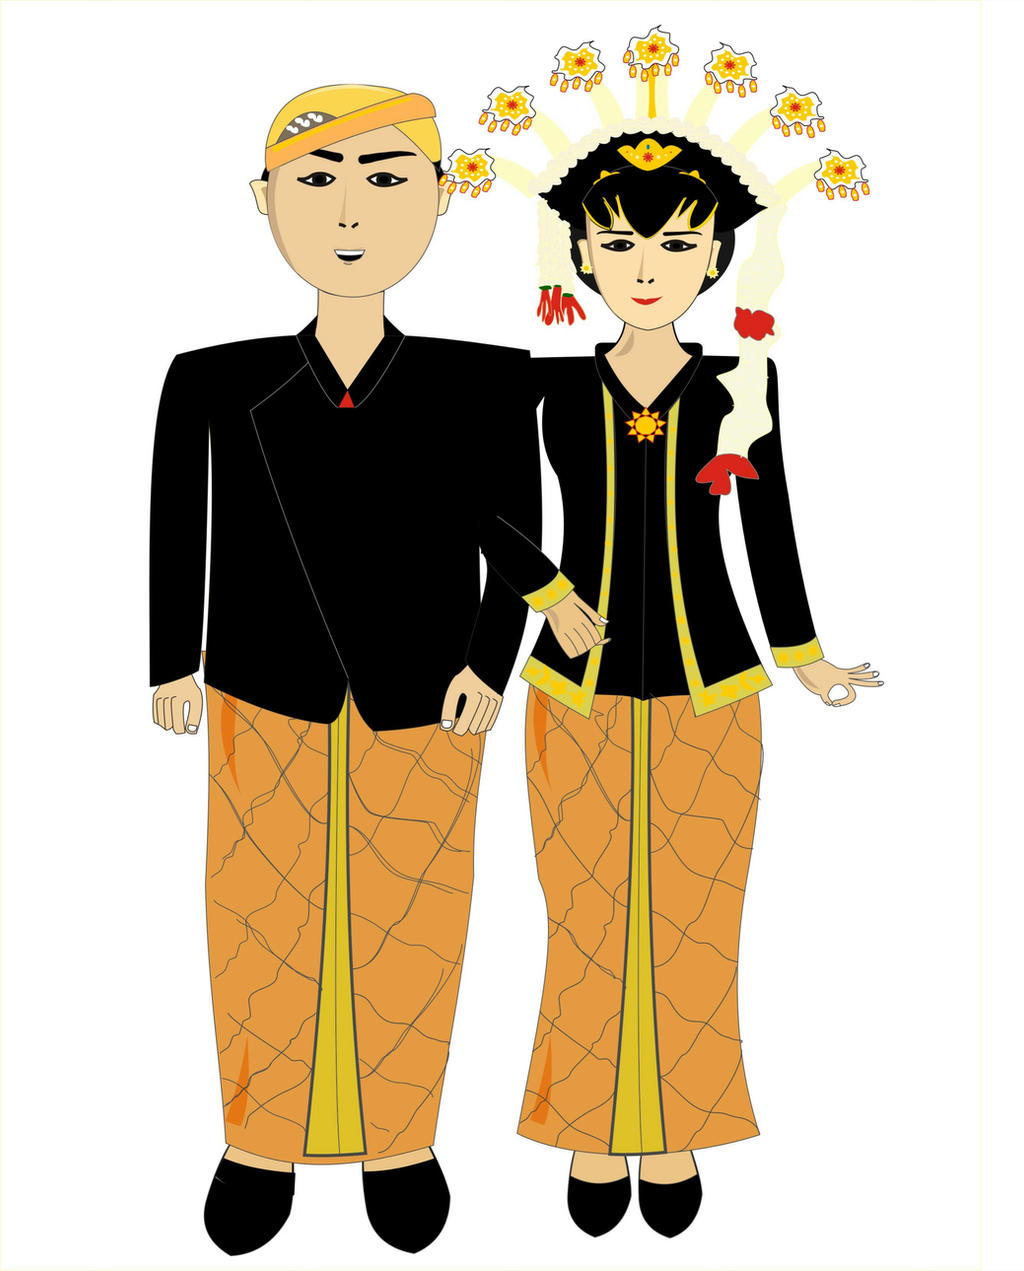 pakaian adat jawa tengah by rosalinamurhidac on deviantart pakaian adat jawa tengah by